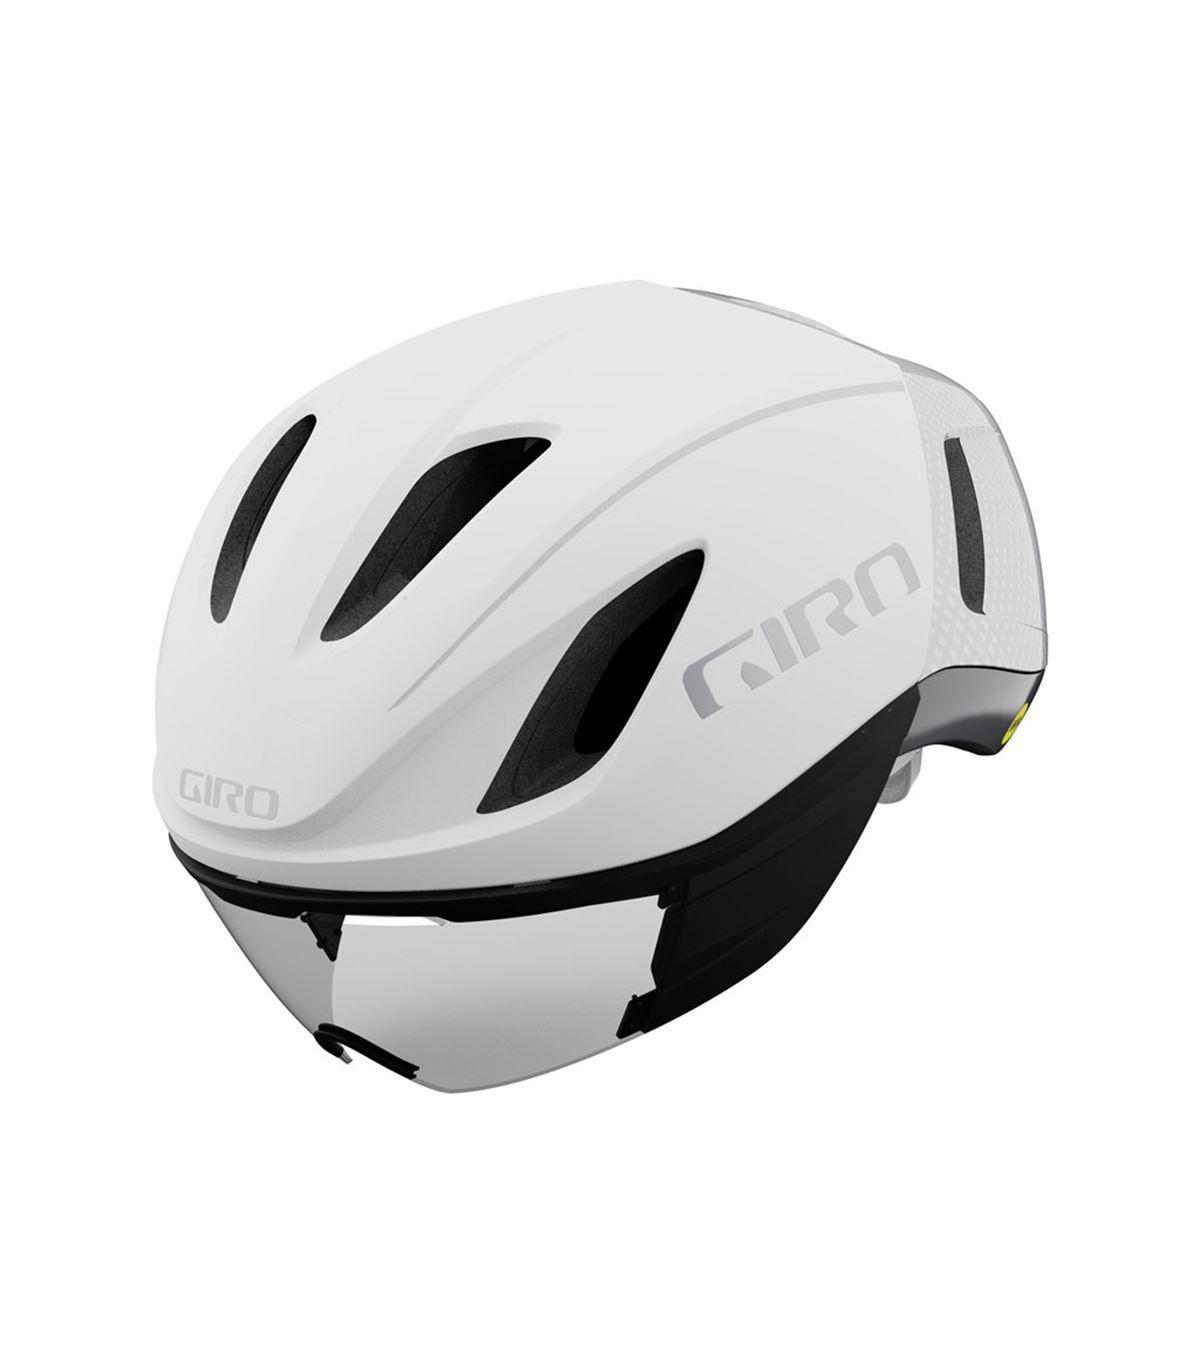 Giro Vanquish Mips · Producto Giro · Cascos · Ciclismo · Kukimbia Shop - Tienda Online Deportiva